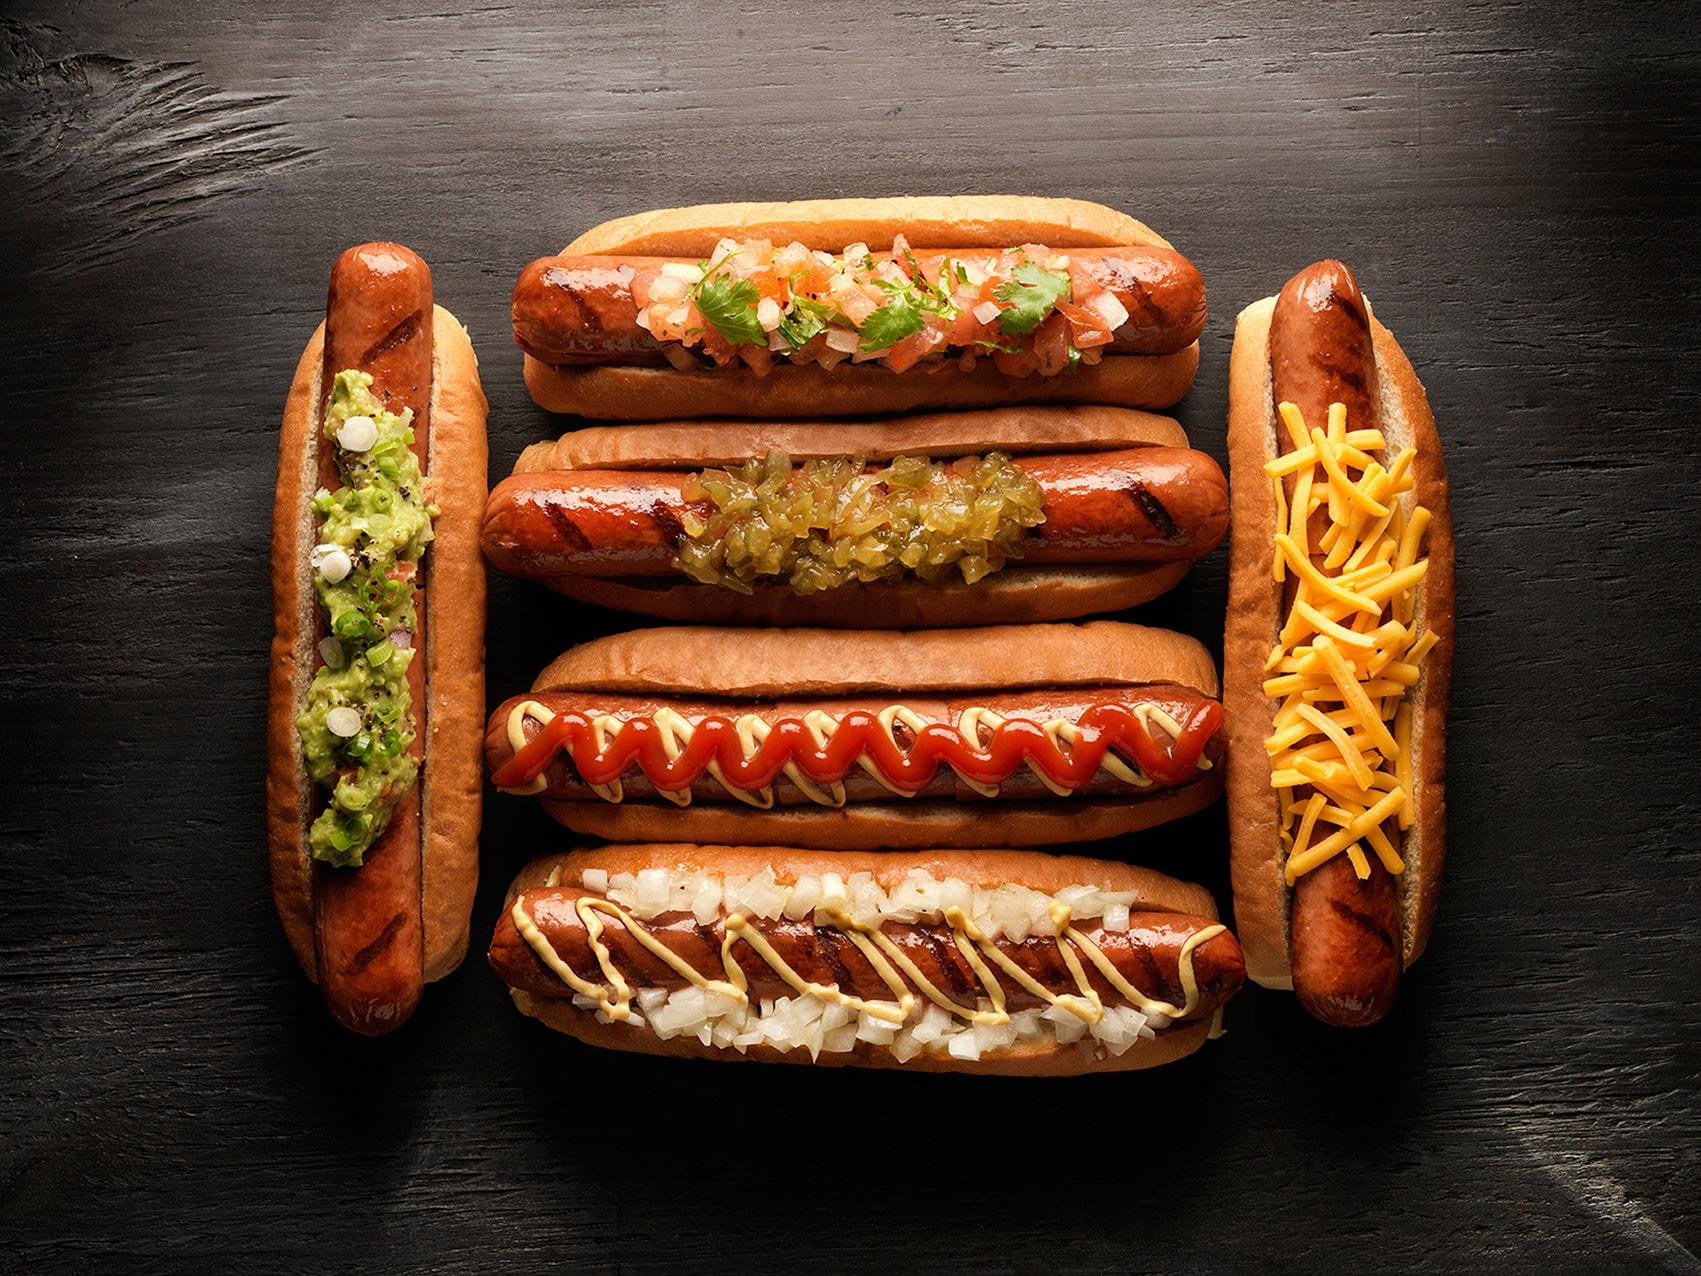 hotdog-food-photography-miami-marcel-boldu.jpg